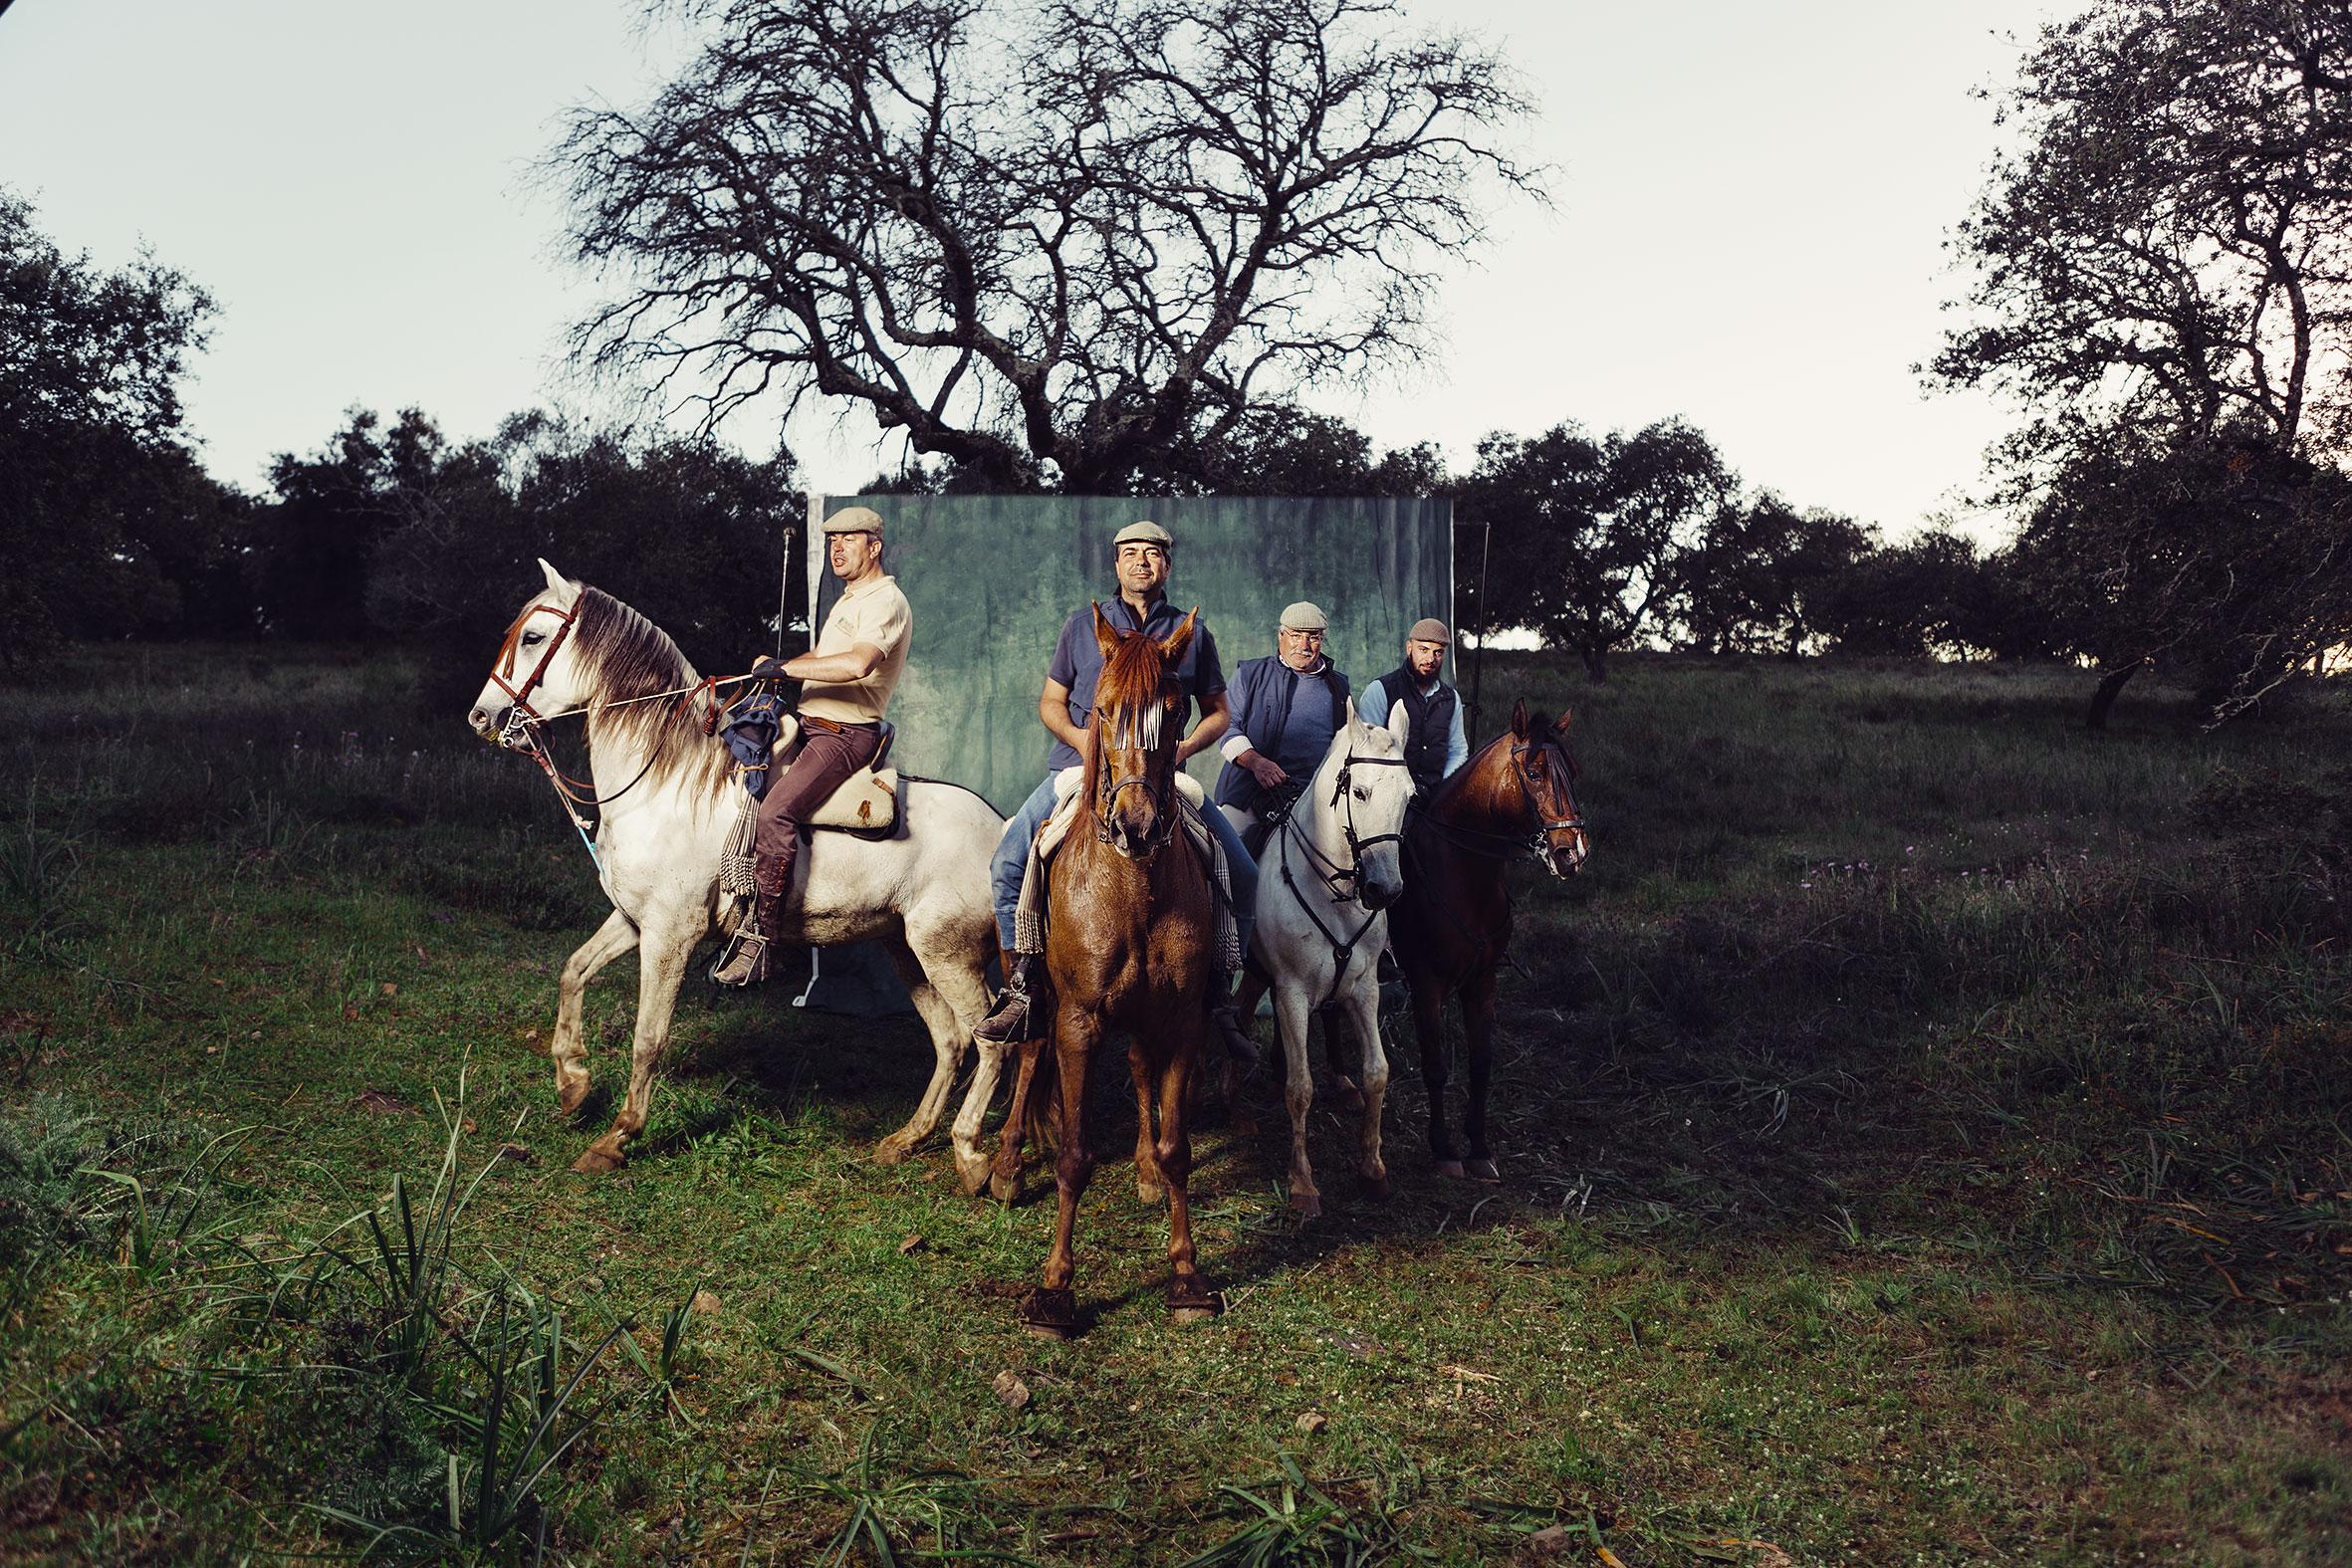 Romaria a cavalo